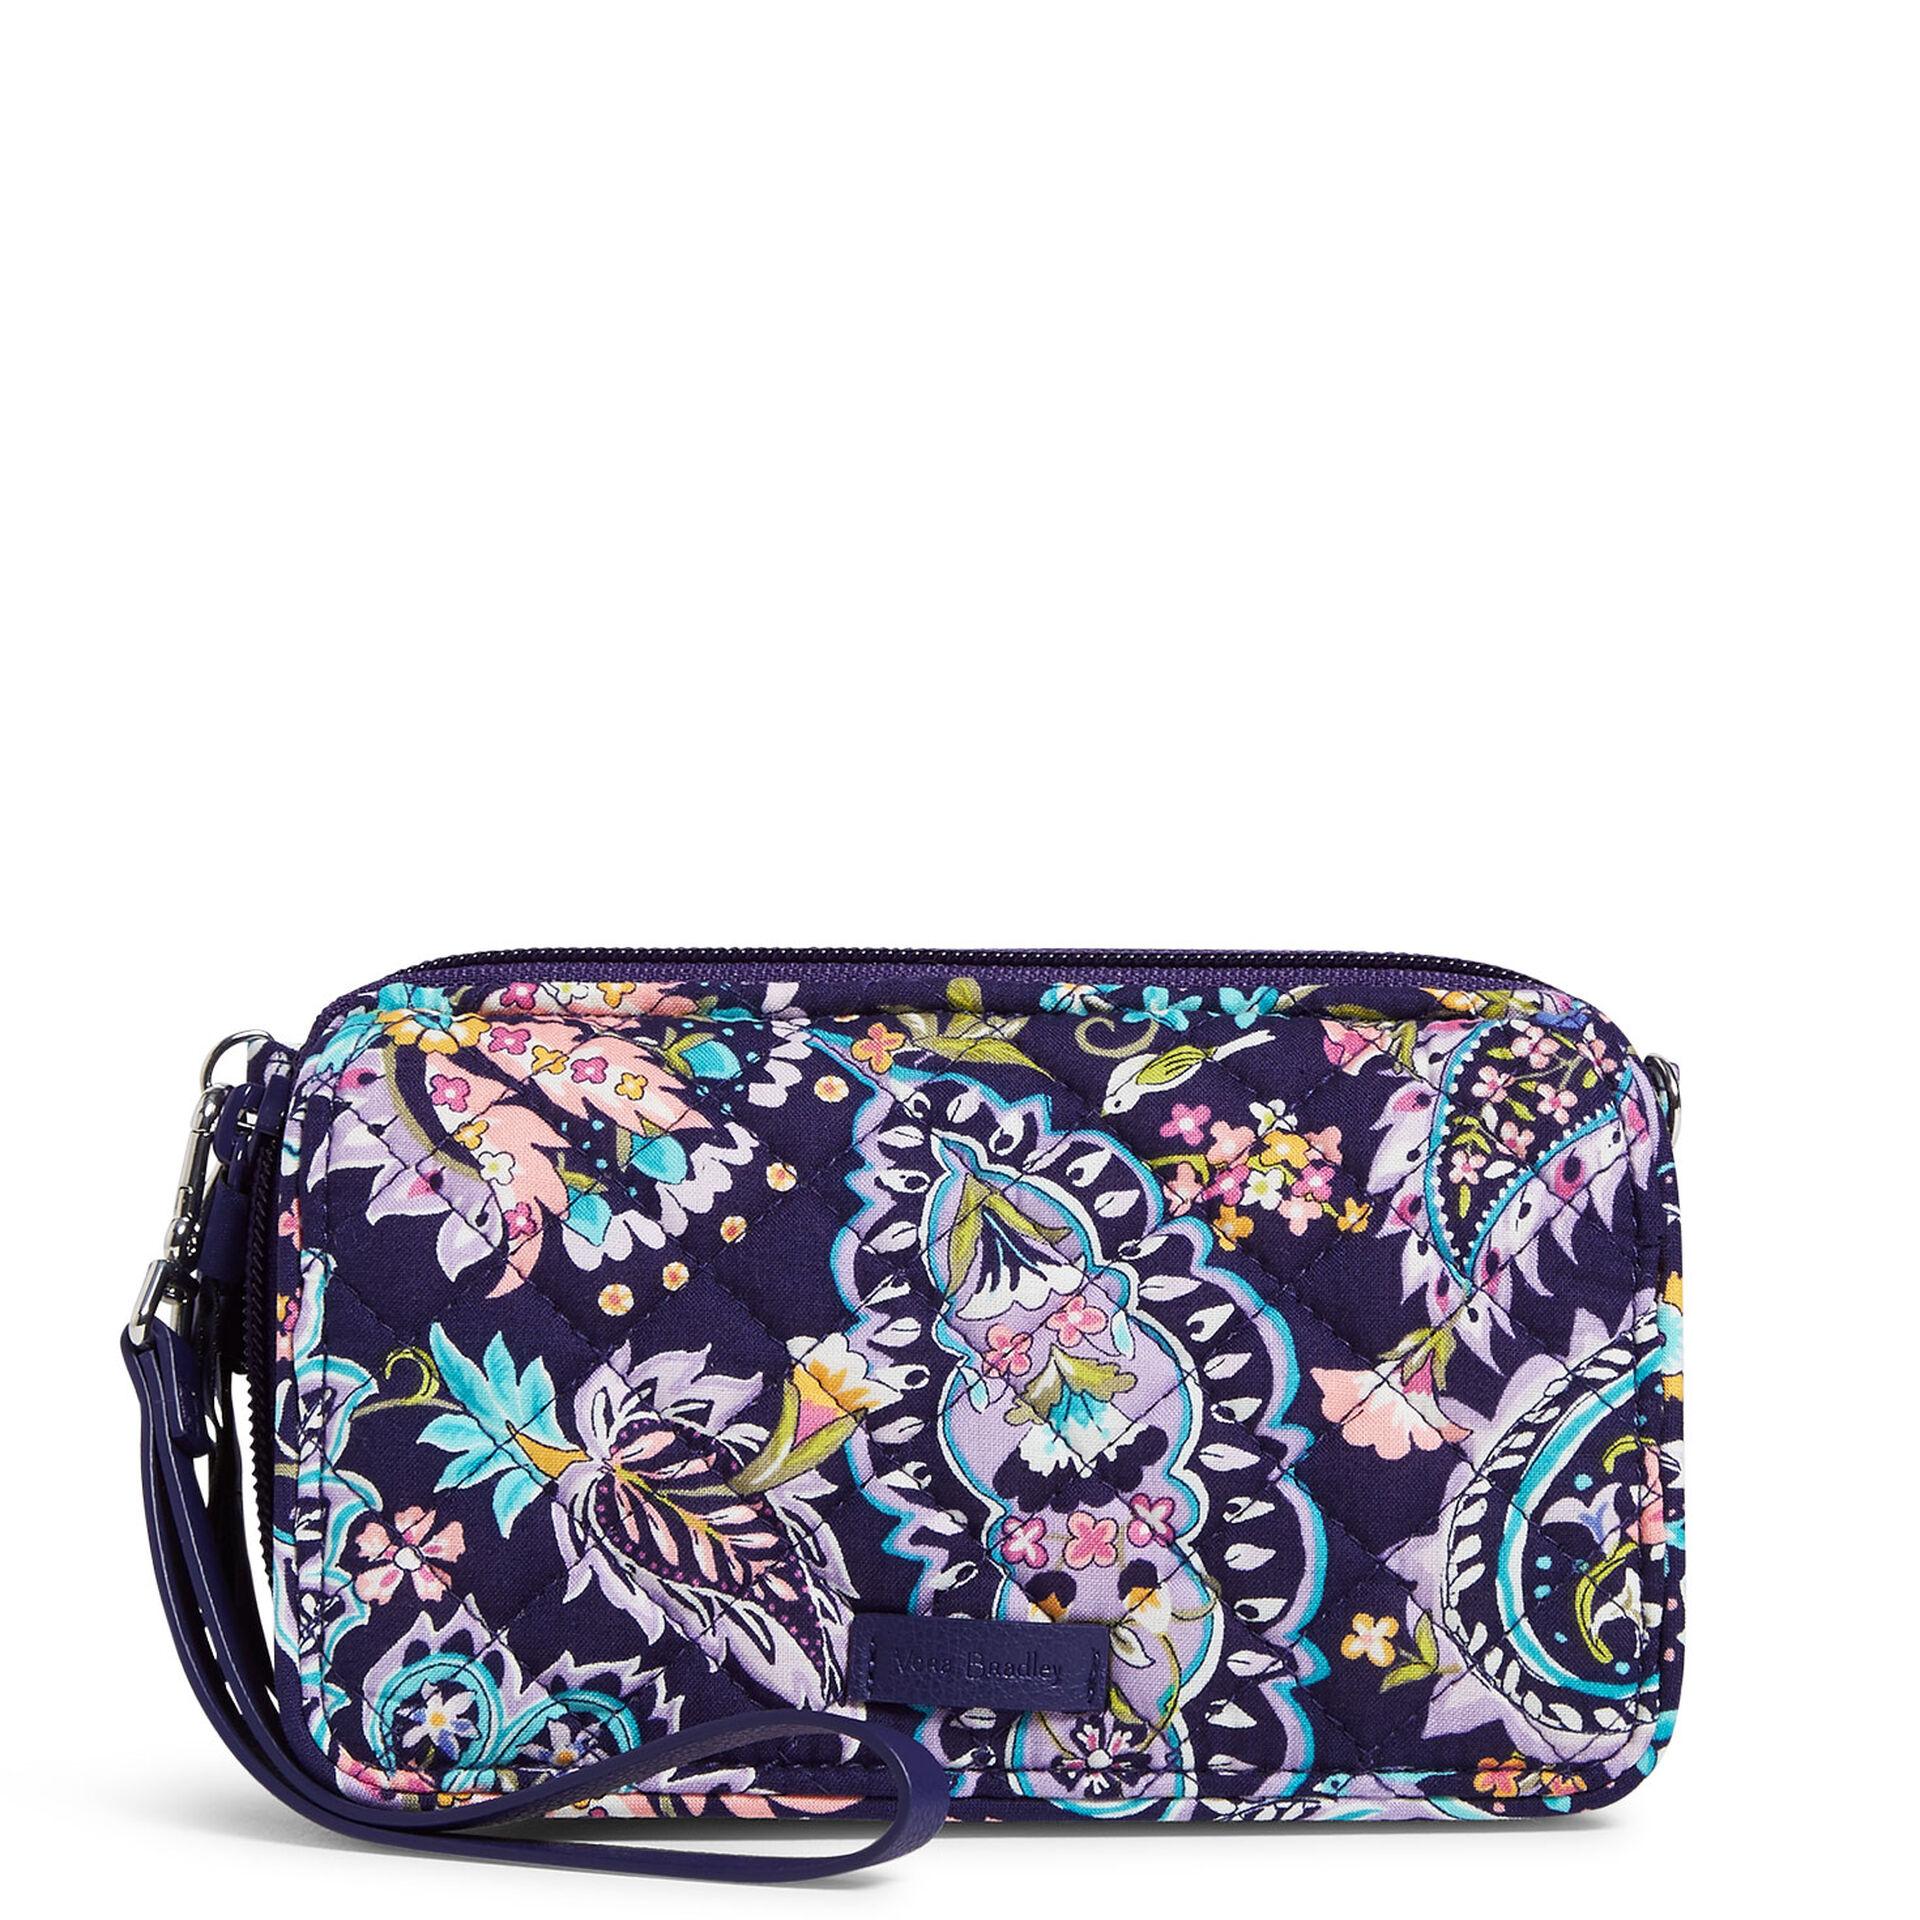 SALE Paisley Tote  Handbag  Purse  Cross Body  I Phone Case